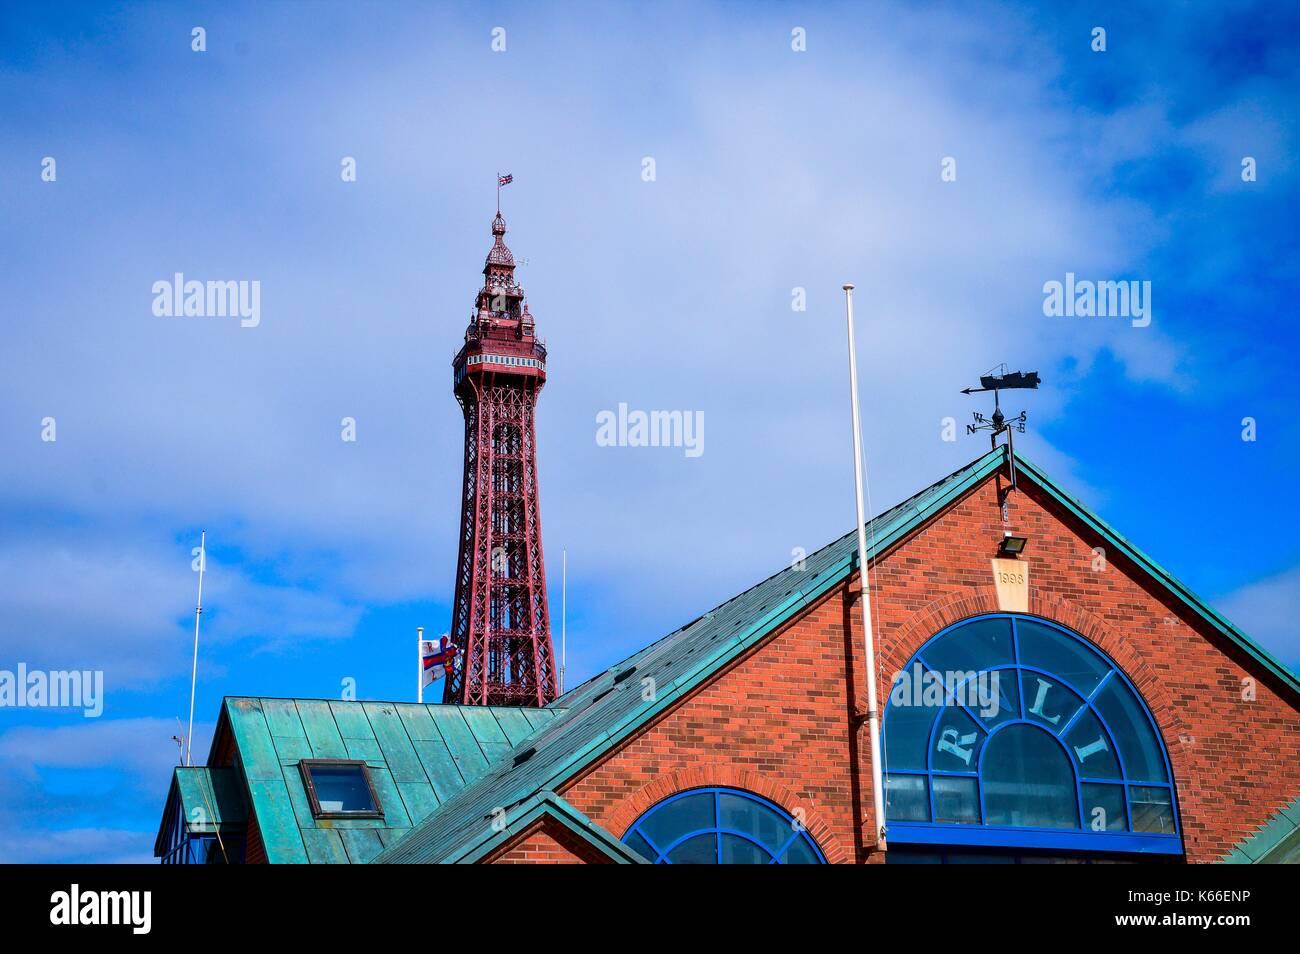 Blackpool RNLI Station & Blackpool Tower - Stock Image